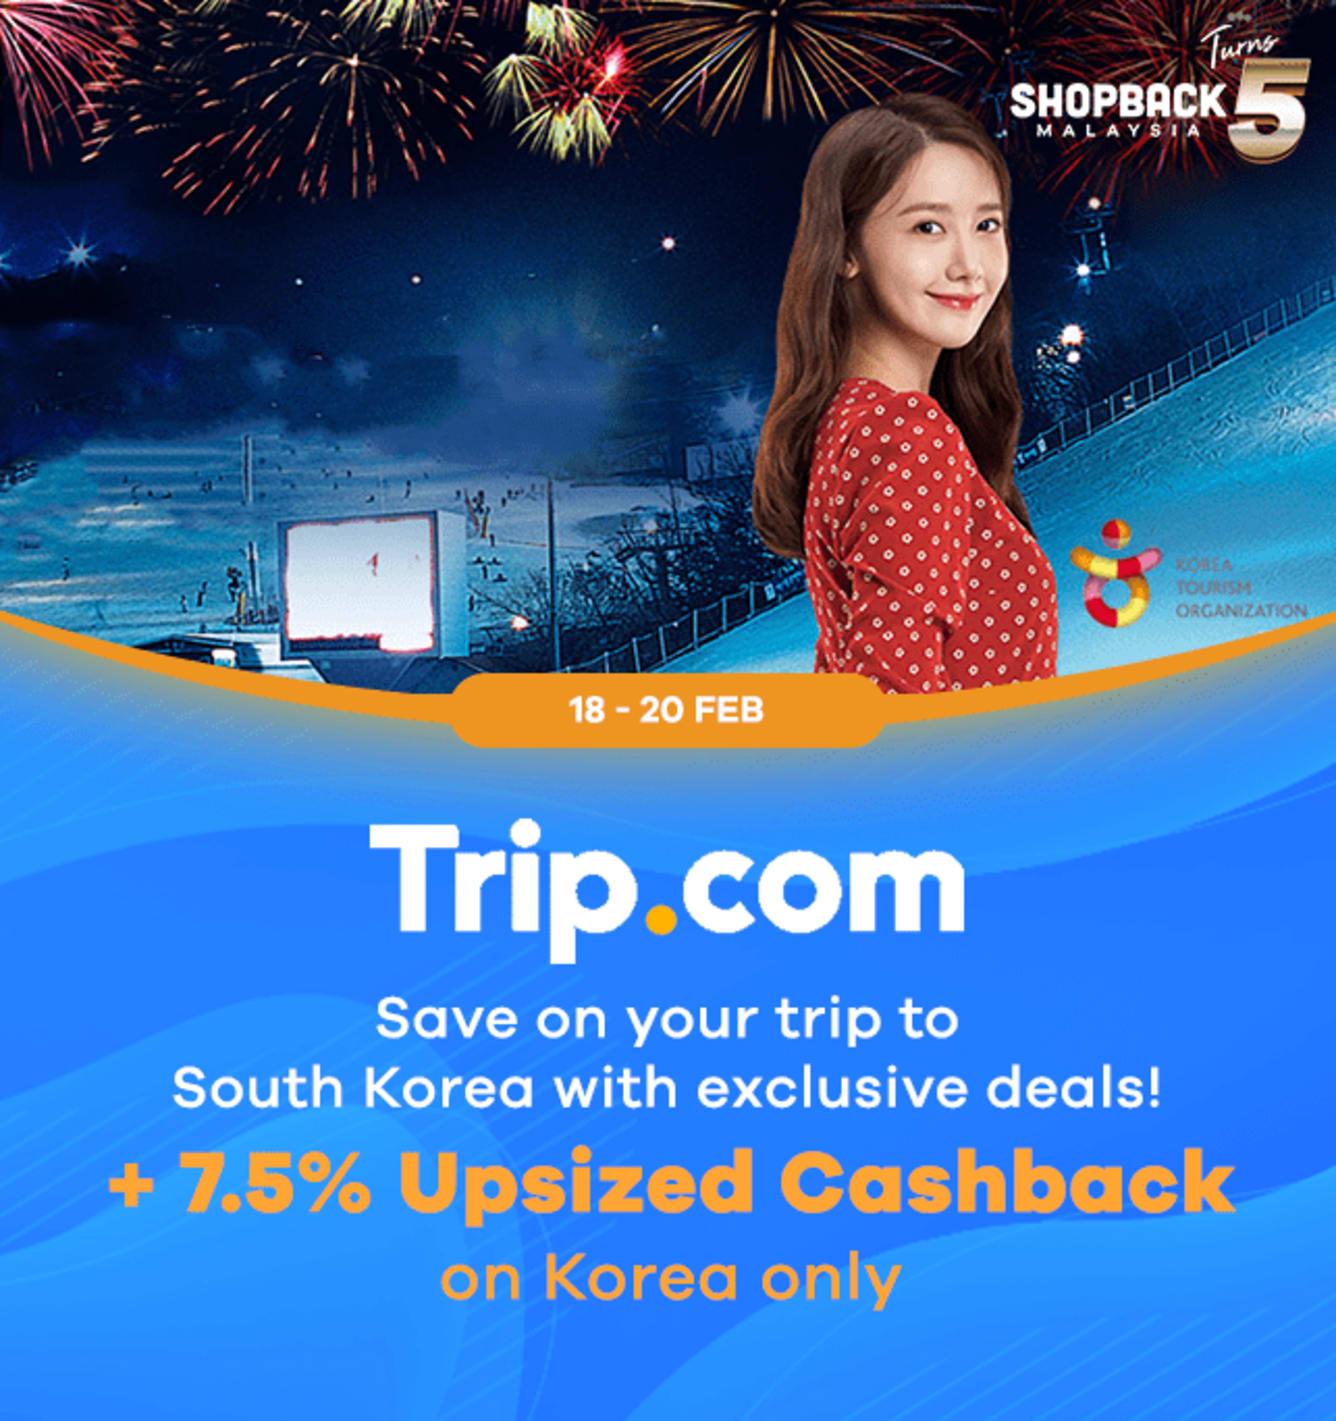 Trip.com 7.5% Upsized Cashback